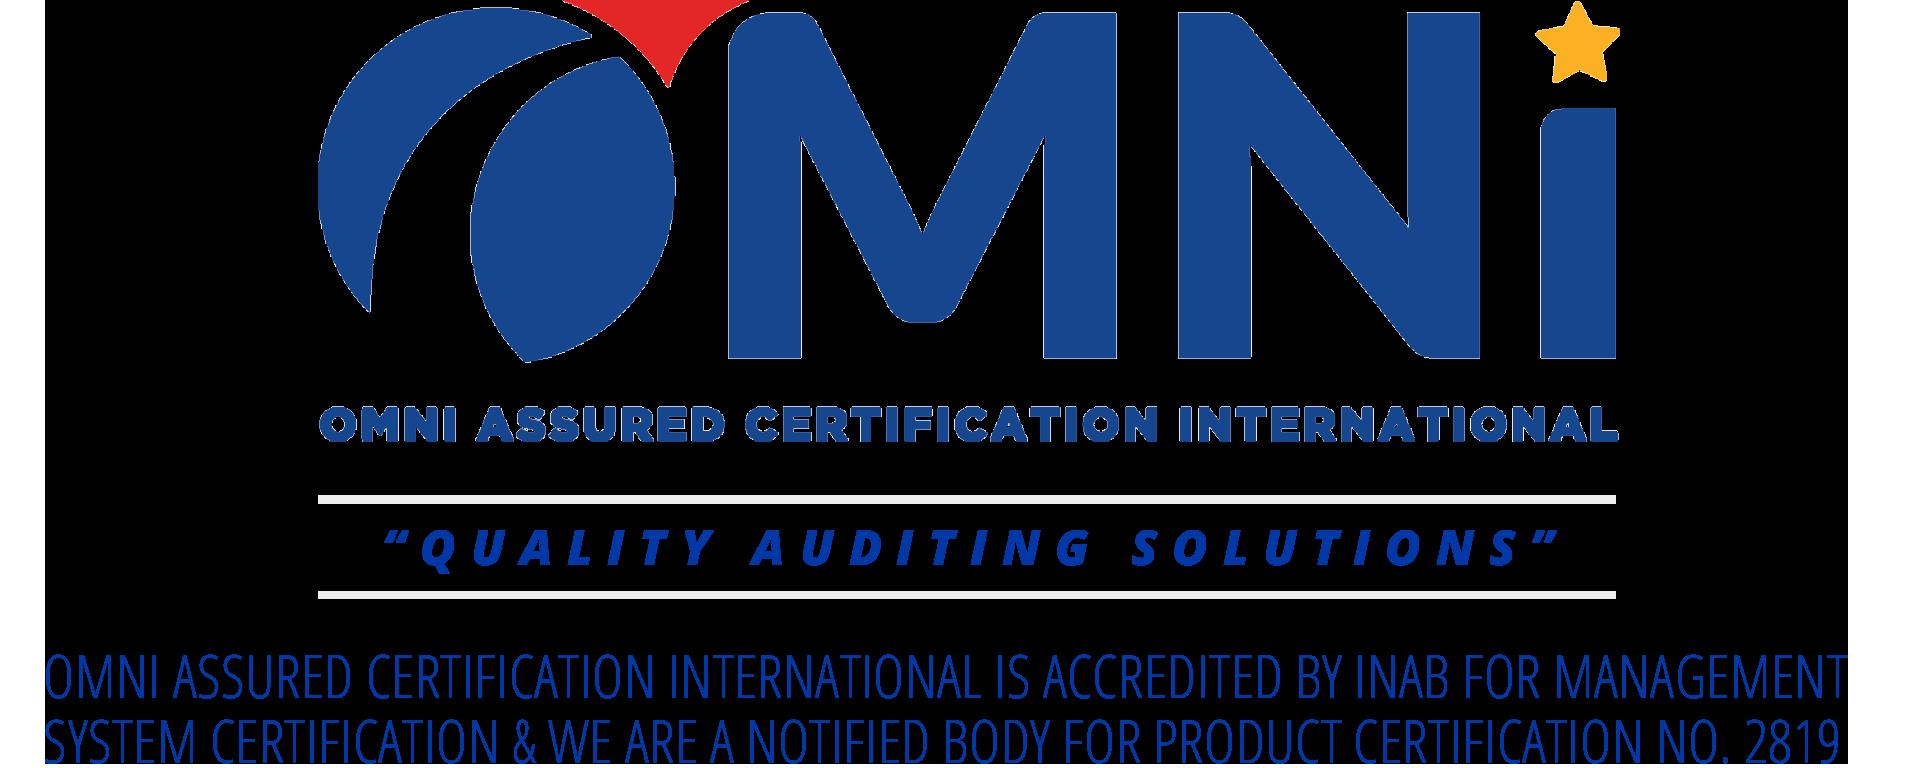 OACI.ie - ISO and EN 1090 Certification